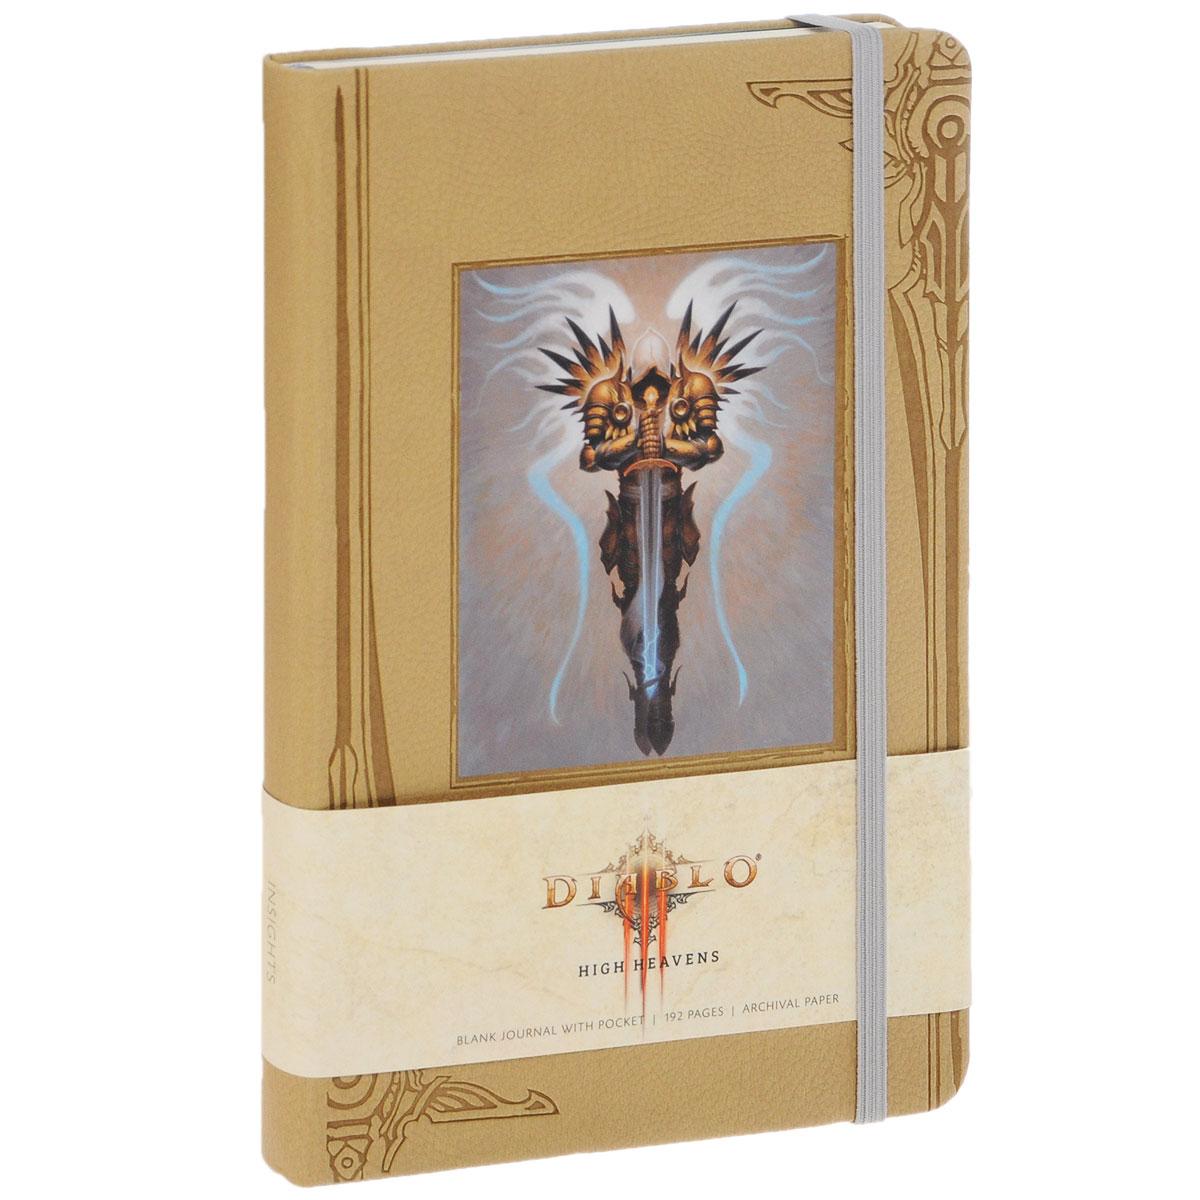 Diablo High Heavens Blank Journal with Pocket